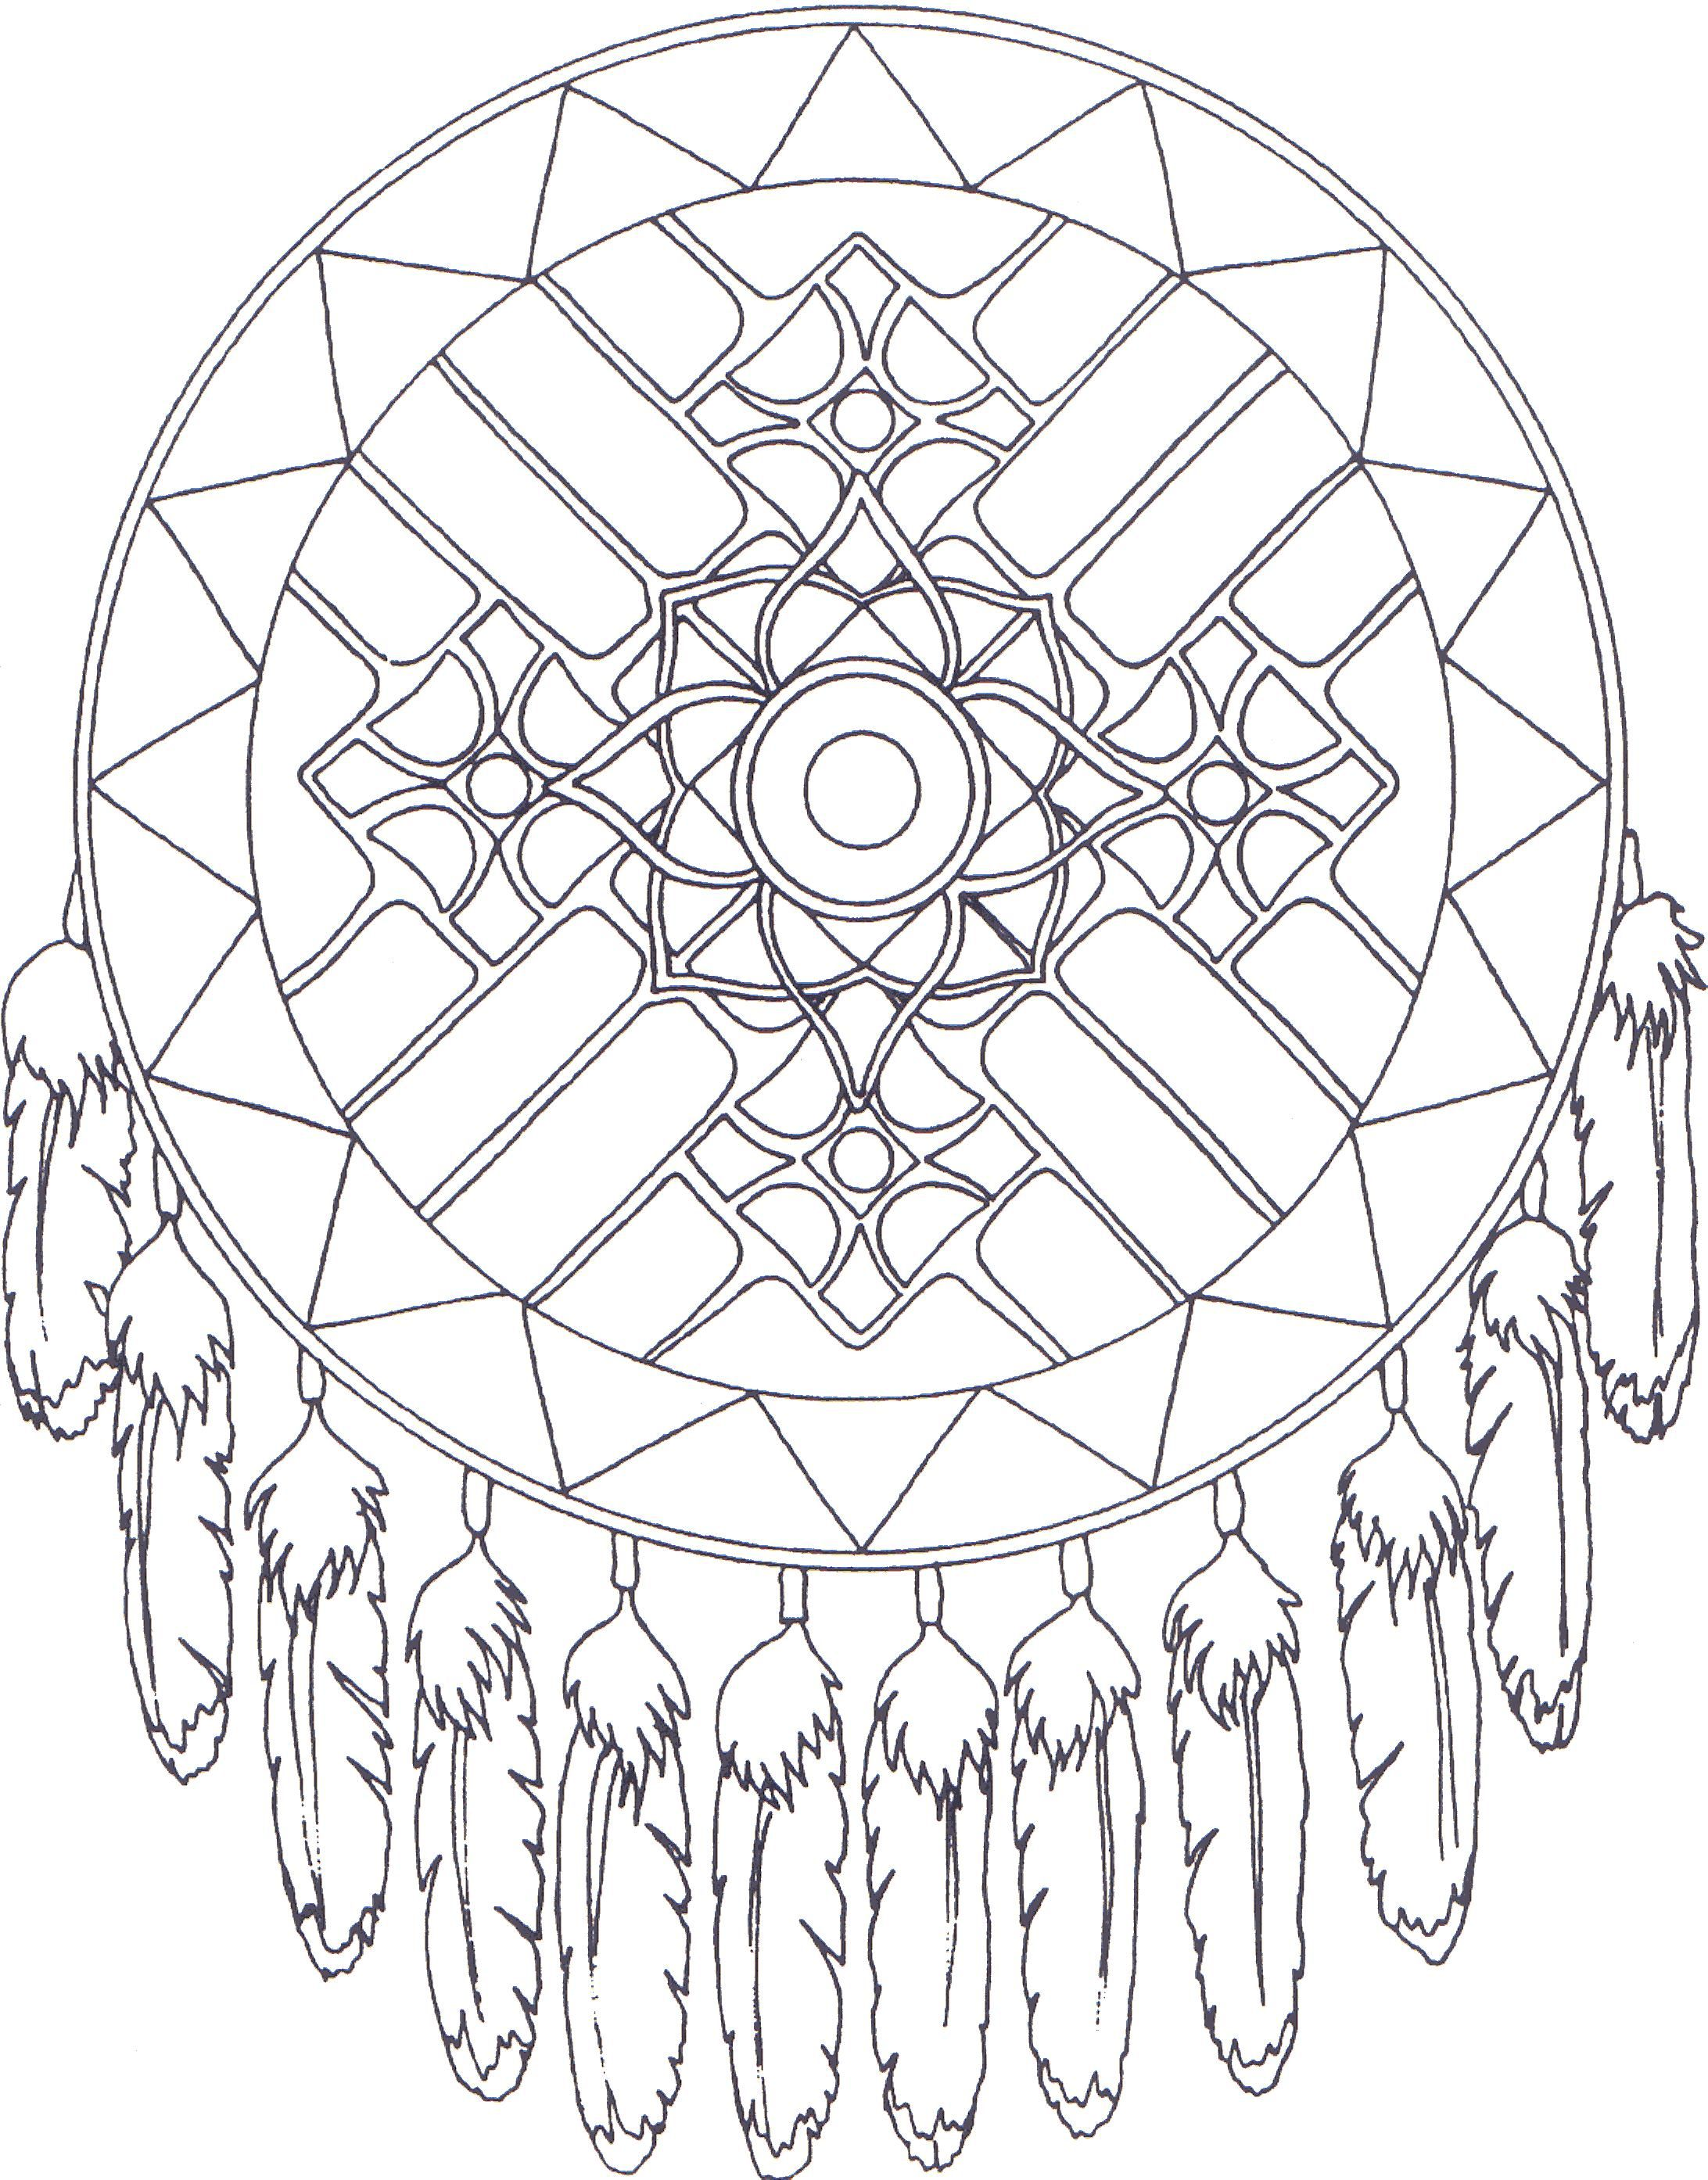 indianen mandala 4.JPG (2184×2788) | Embroidery | Pinterest | Native ...